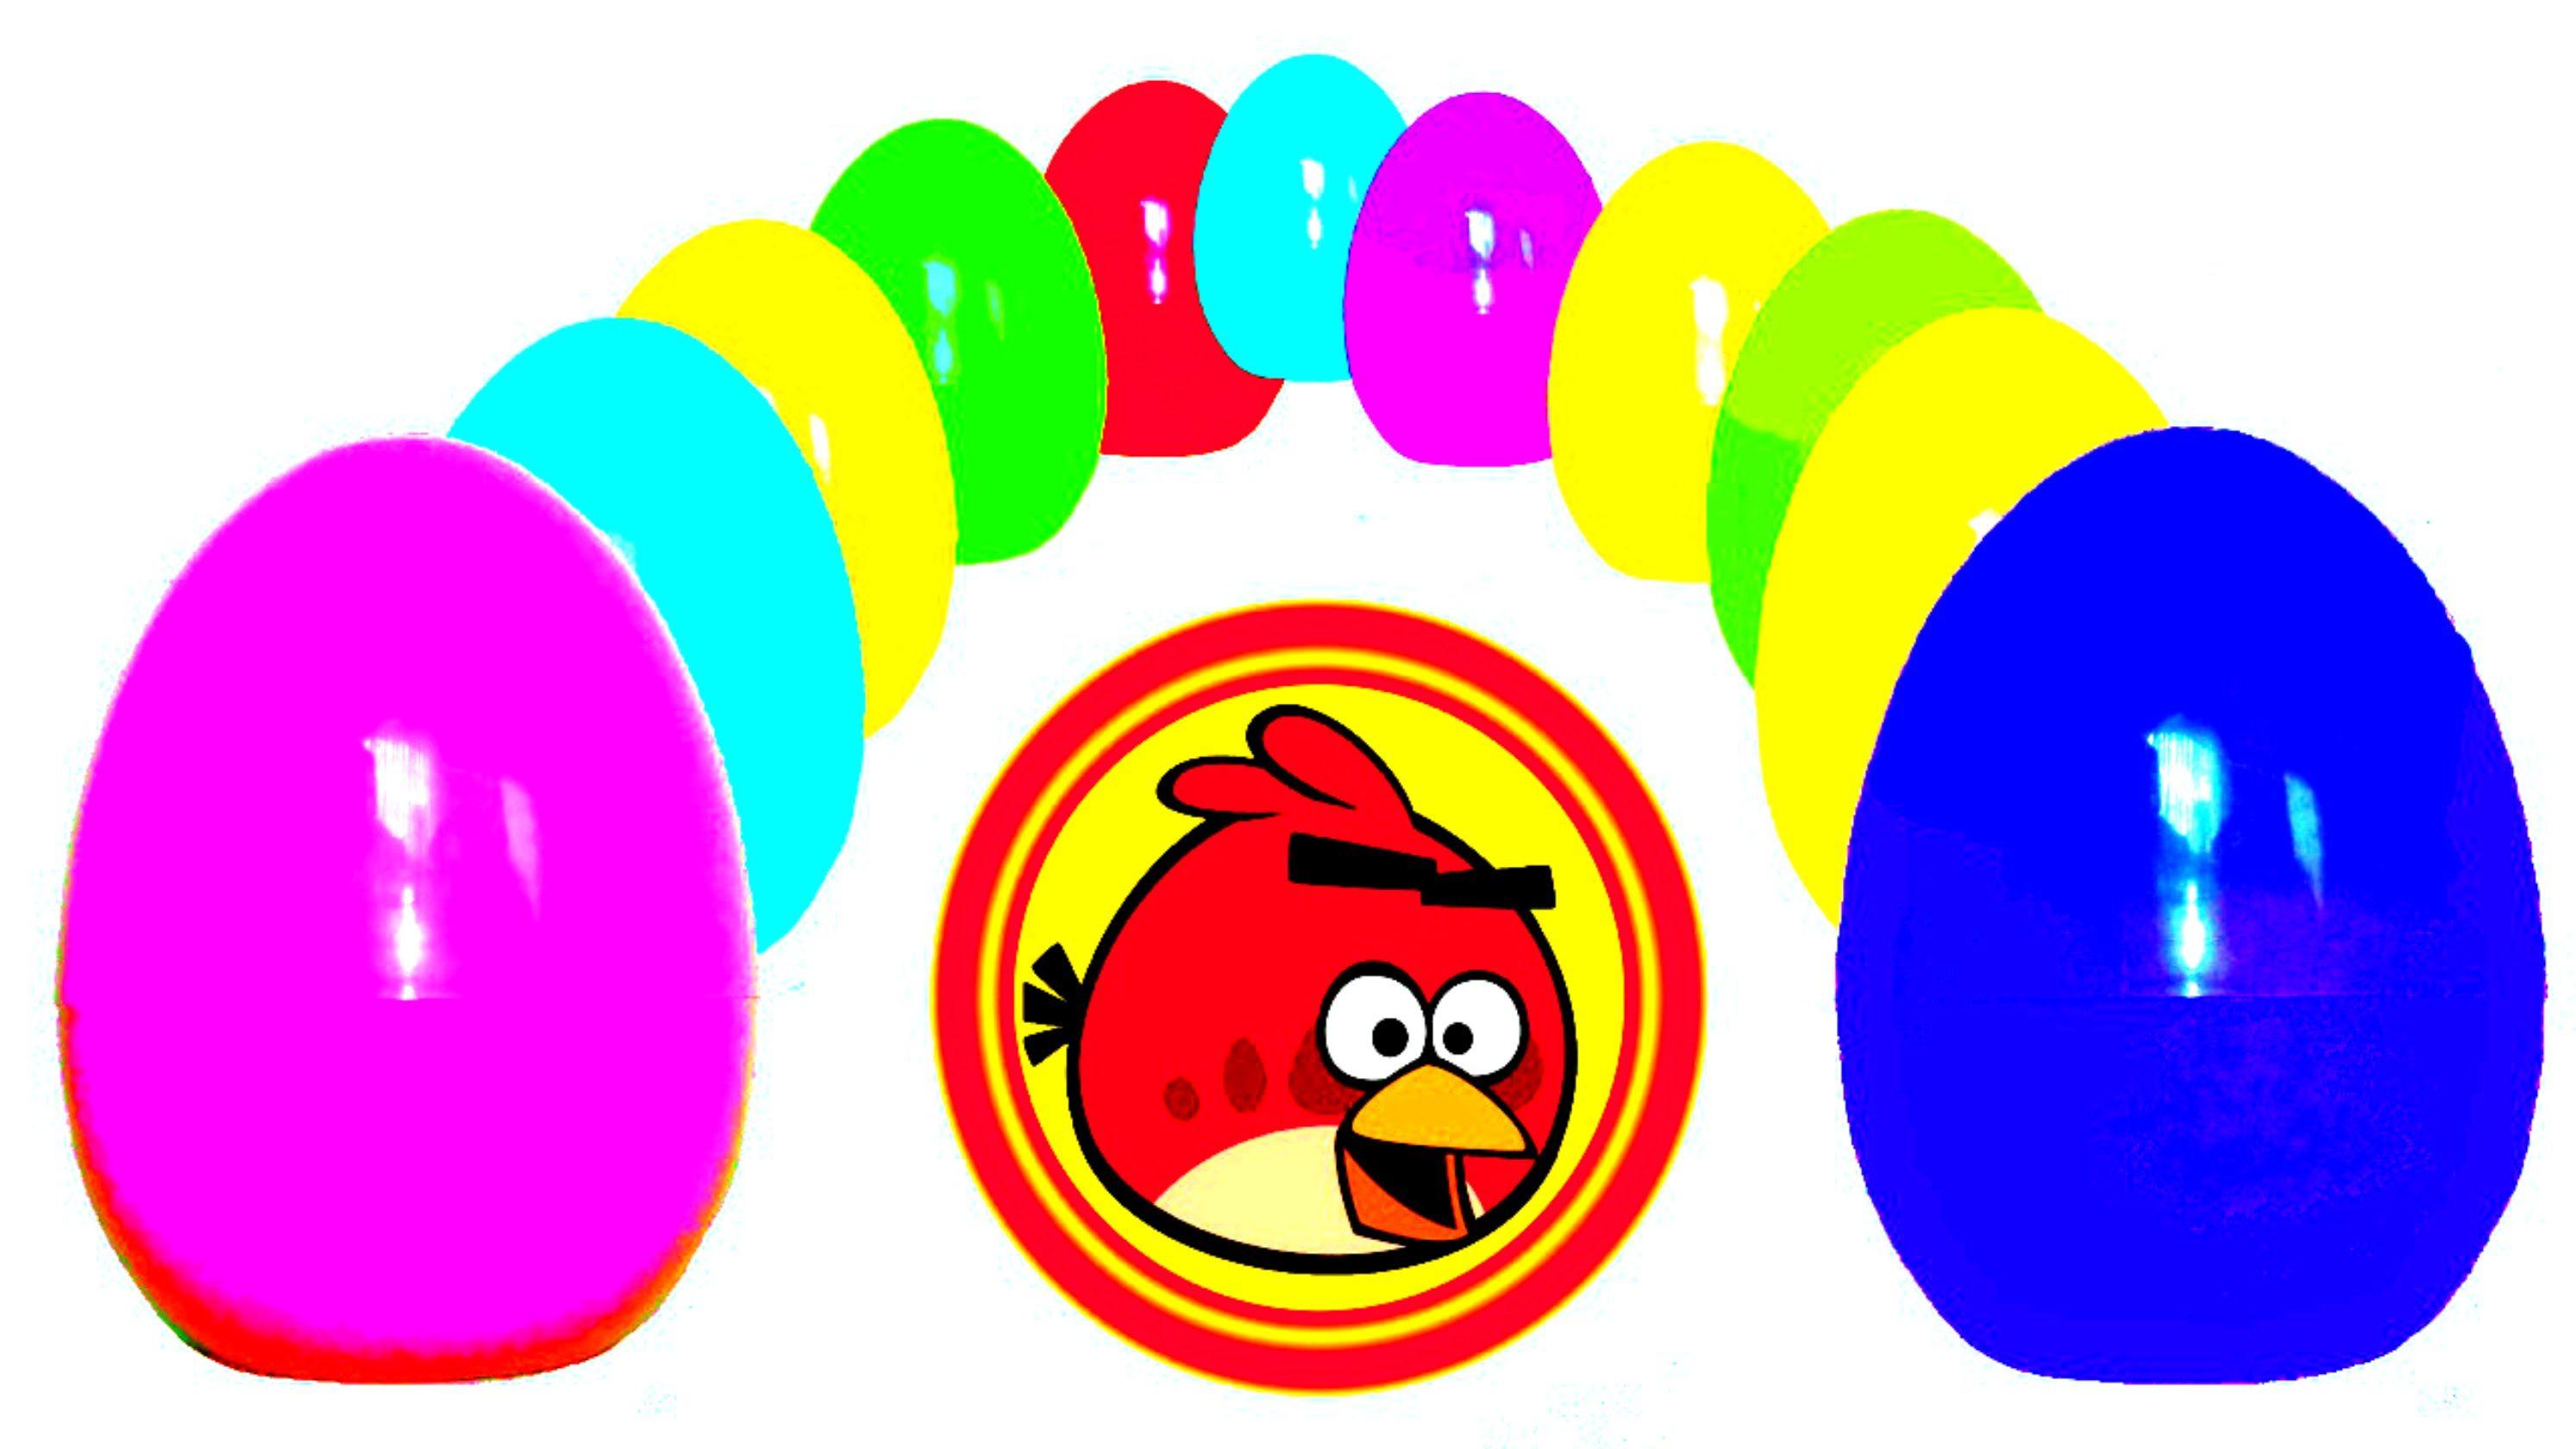 Kinder joy toys car   surprise eggs disney toys kinder surprise collection toys Kinder